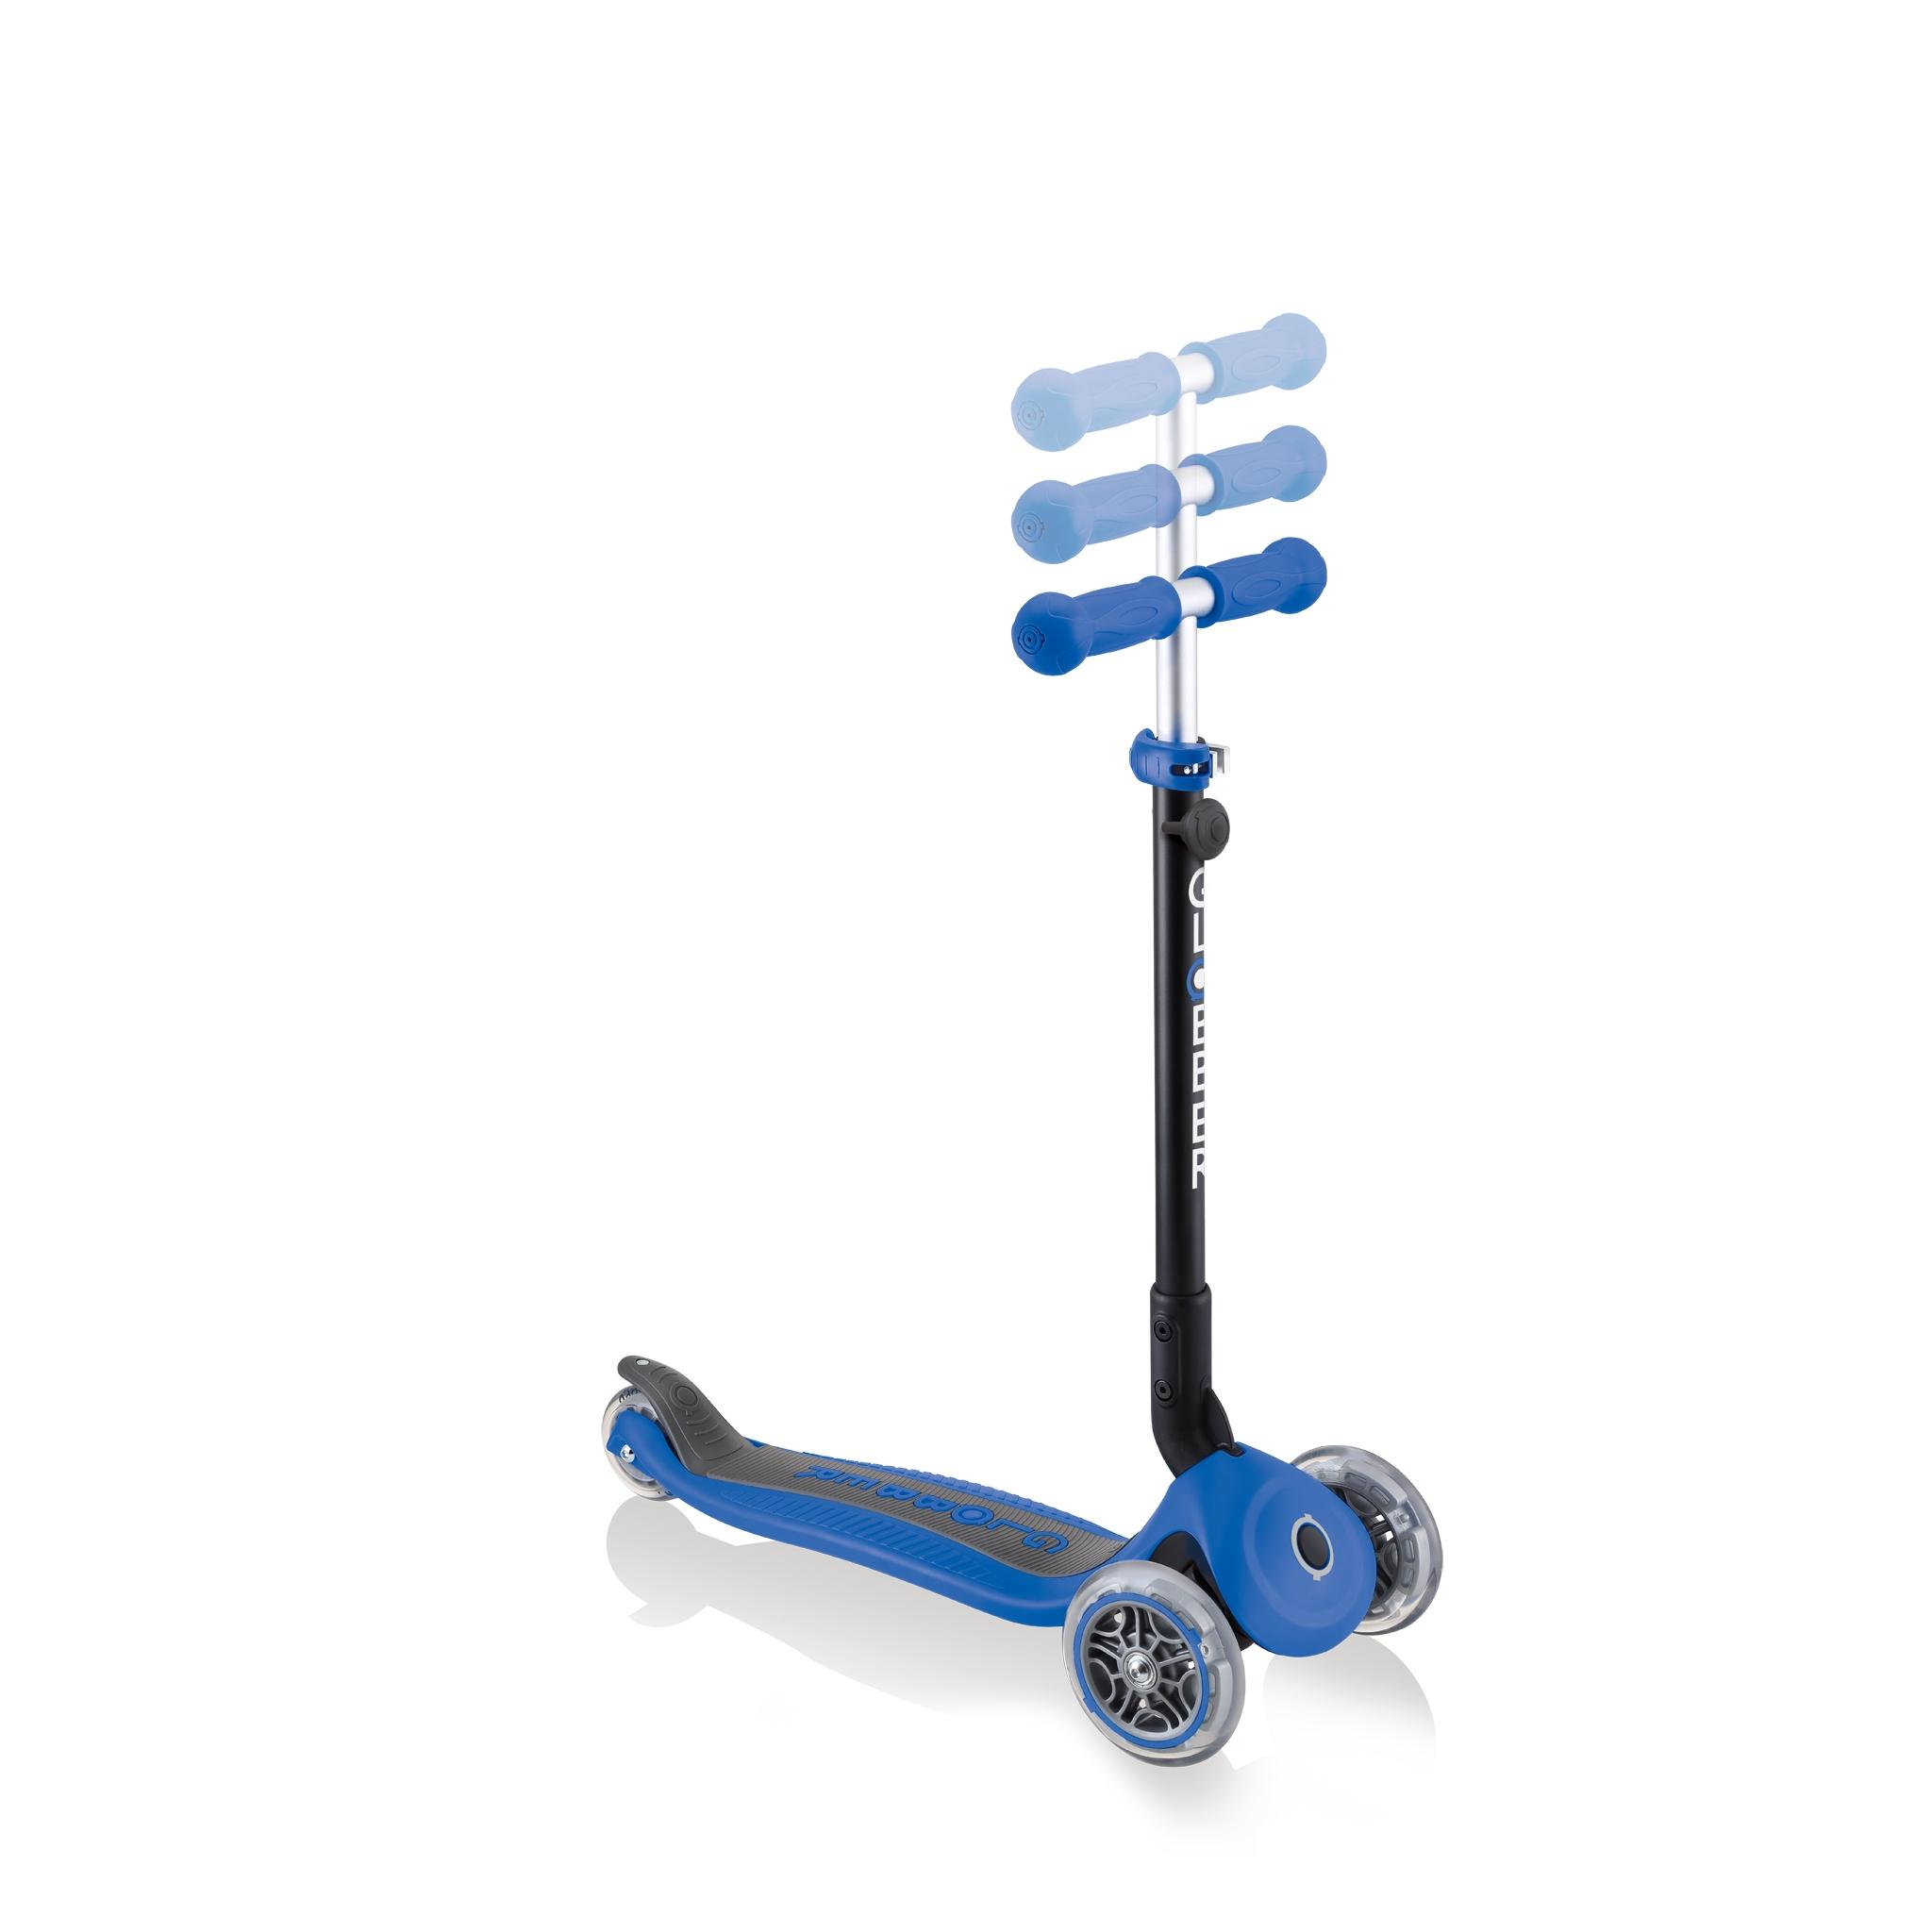 Globber-GO-UP-FOLDABLE-adjustable-scooter-for-toddlers 3